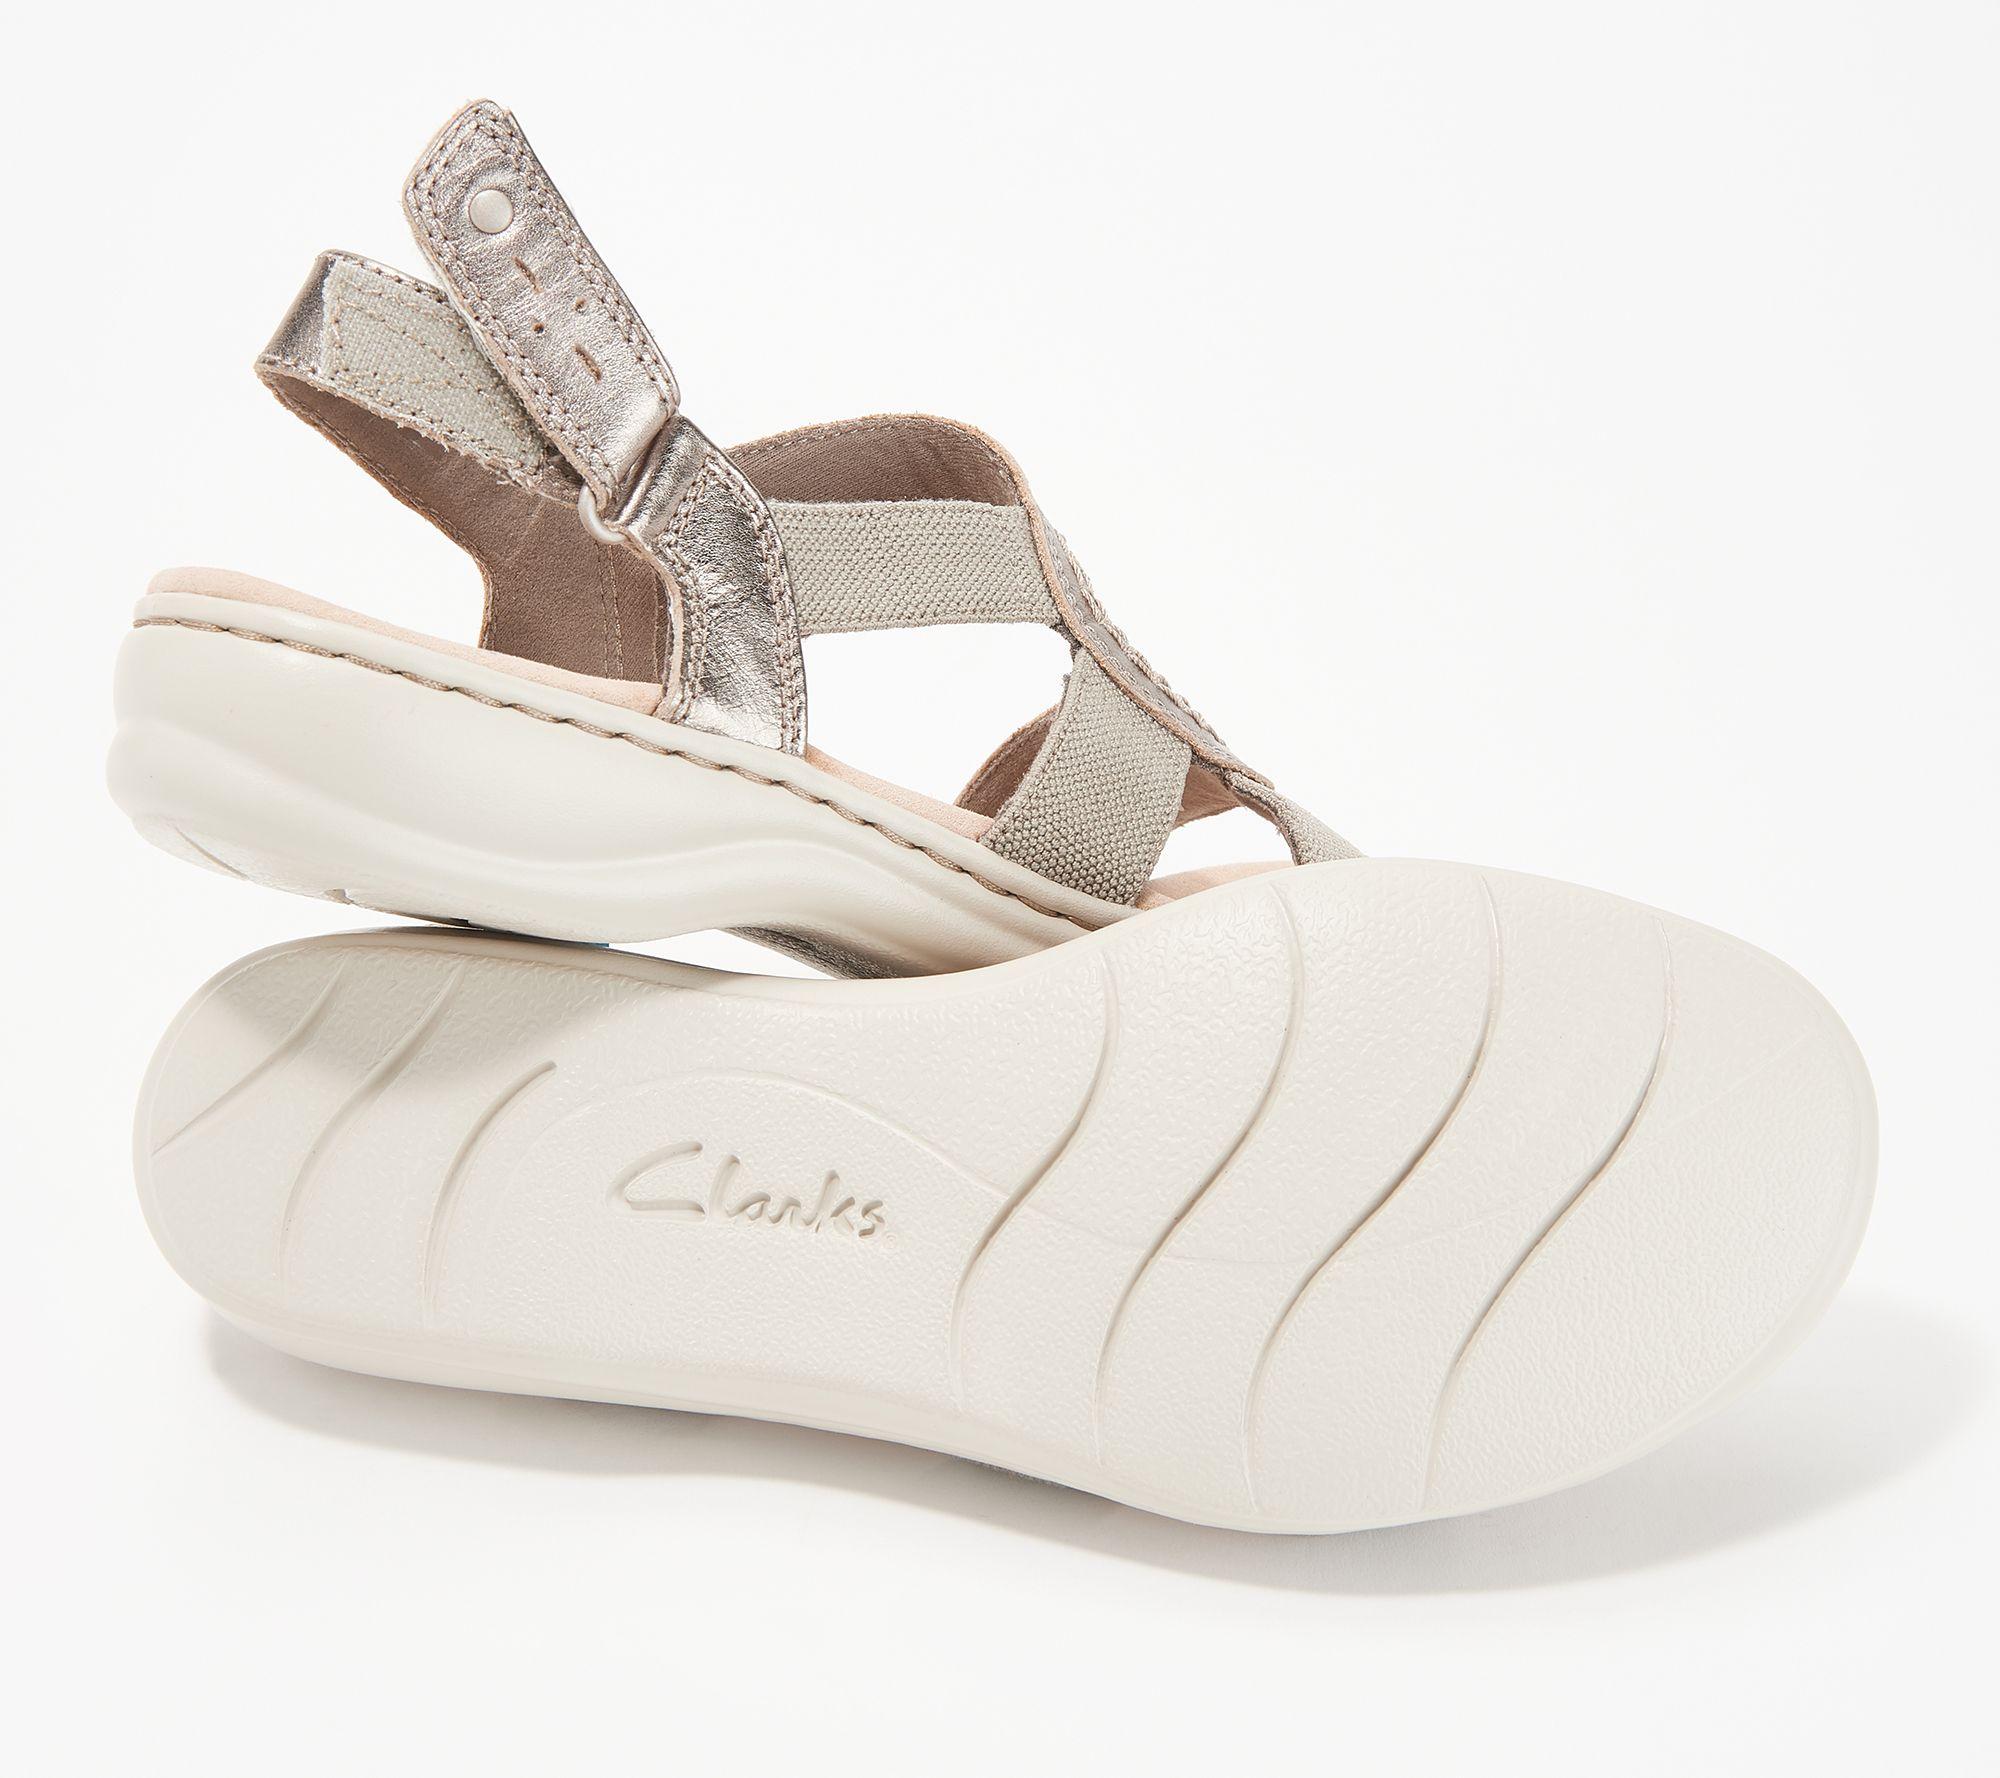 40f7cef46941 Clarks Collection Backstrap Sandals - Leisa Joy - Page 1 — QVC.com